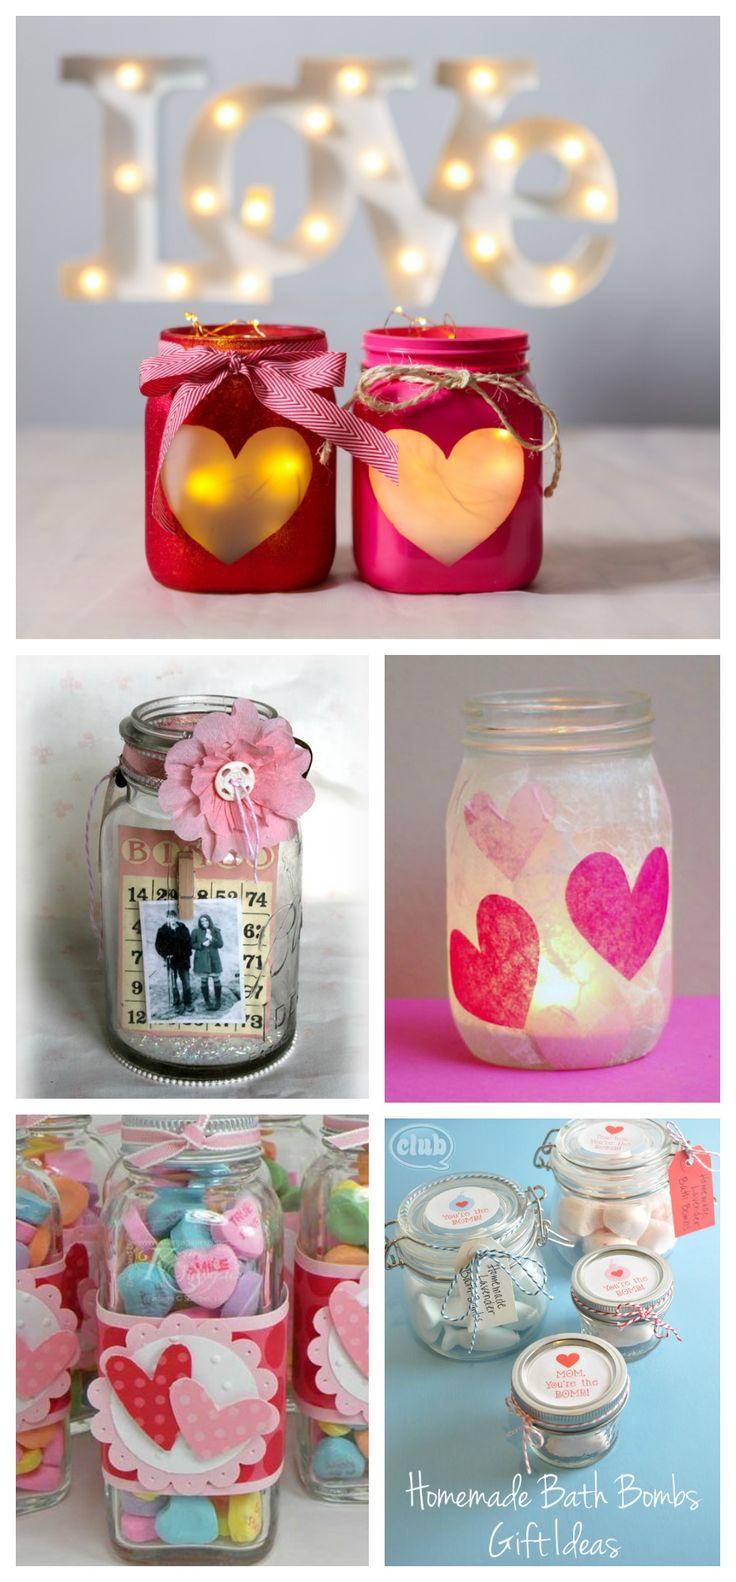 DIY Valentines crafts using mason jars